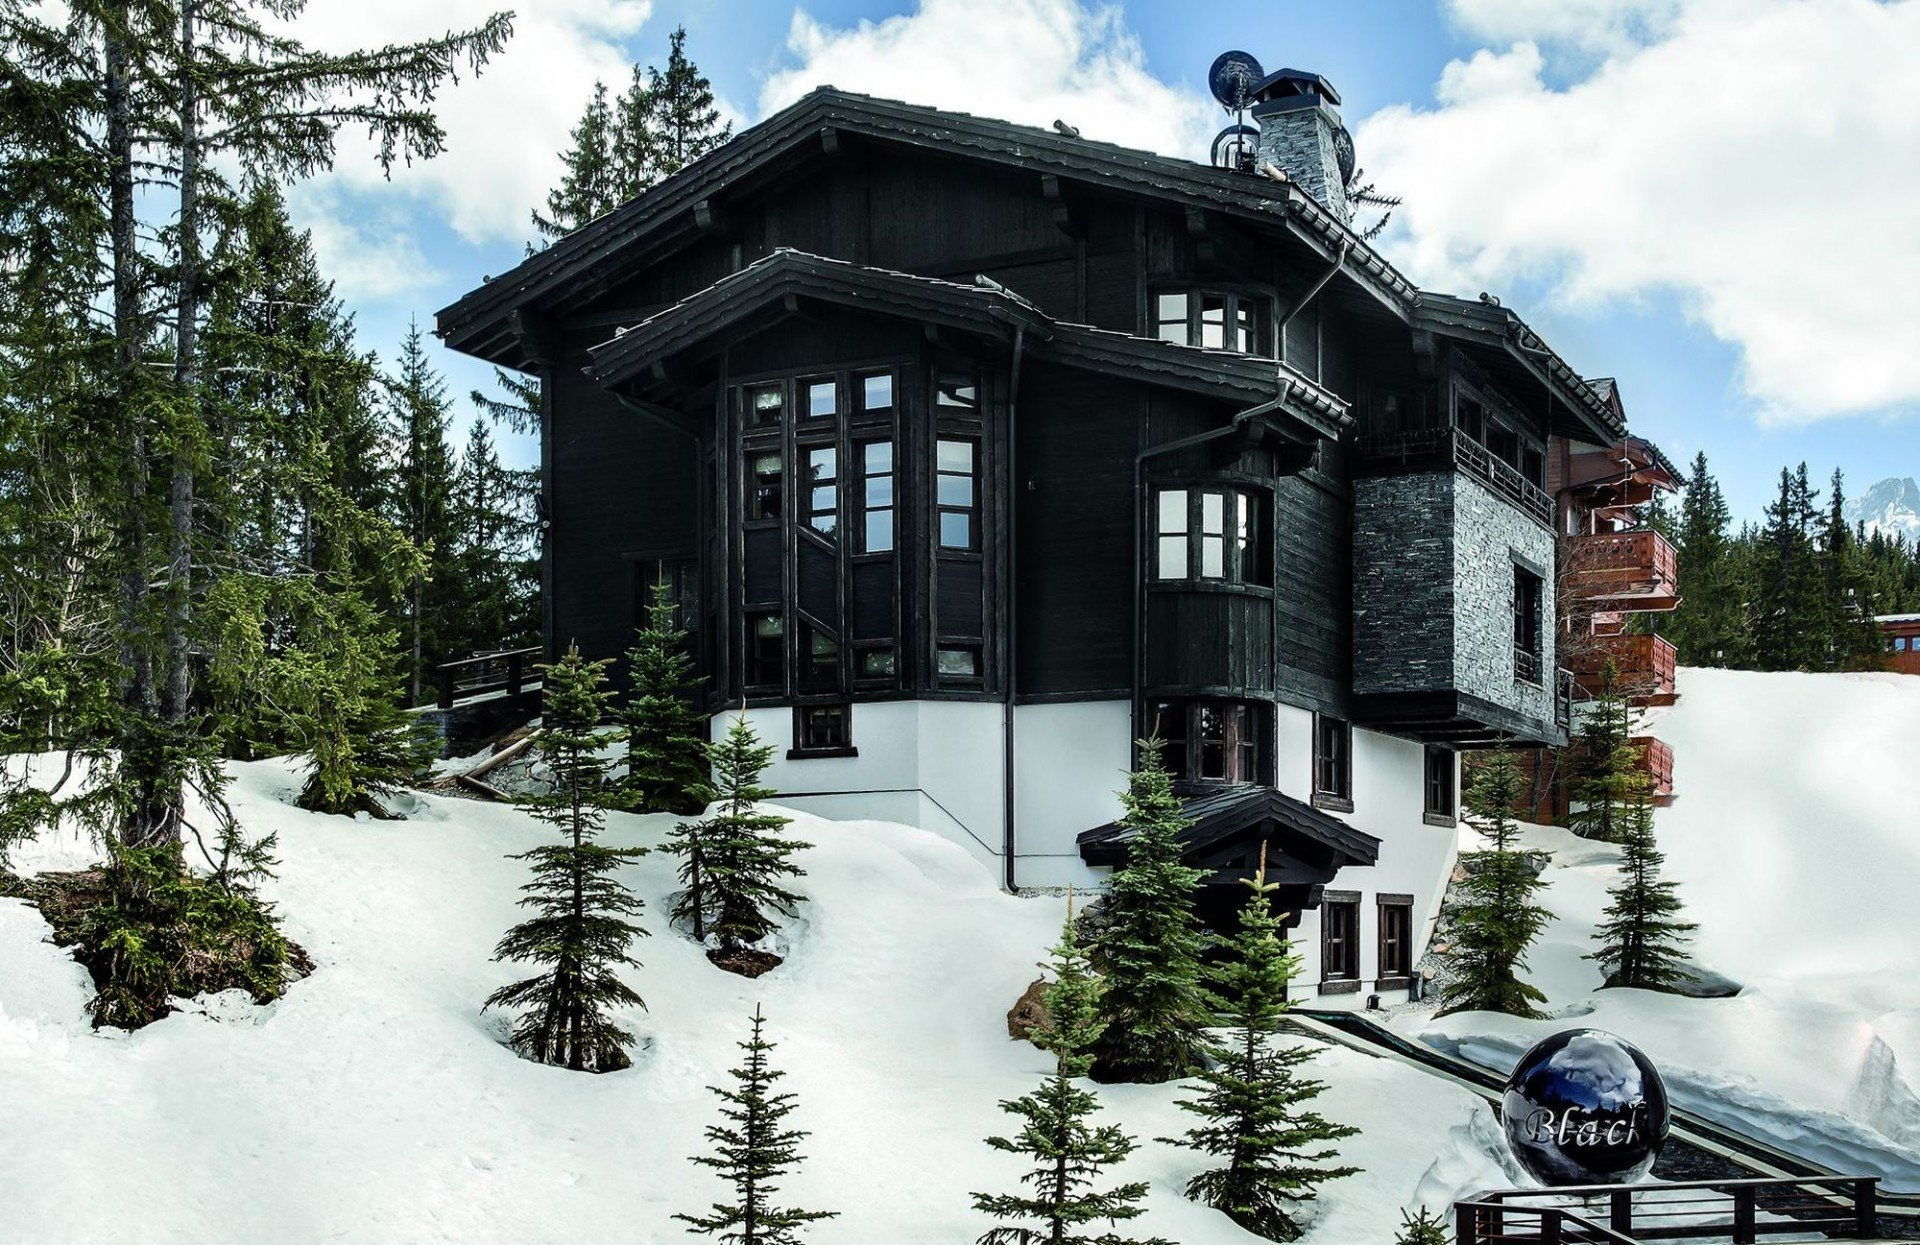 Chalet Black Pearl - Courchevel - villa Chalet Black Pearl ...